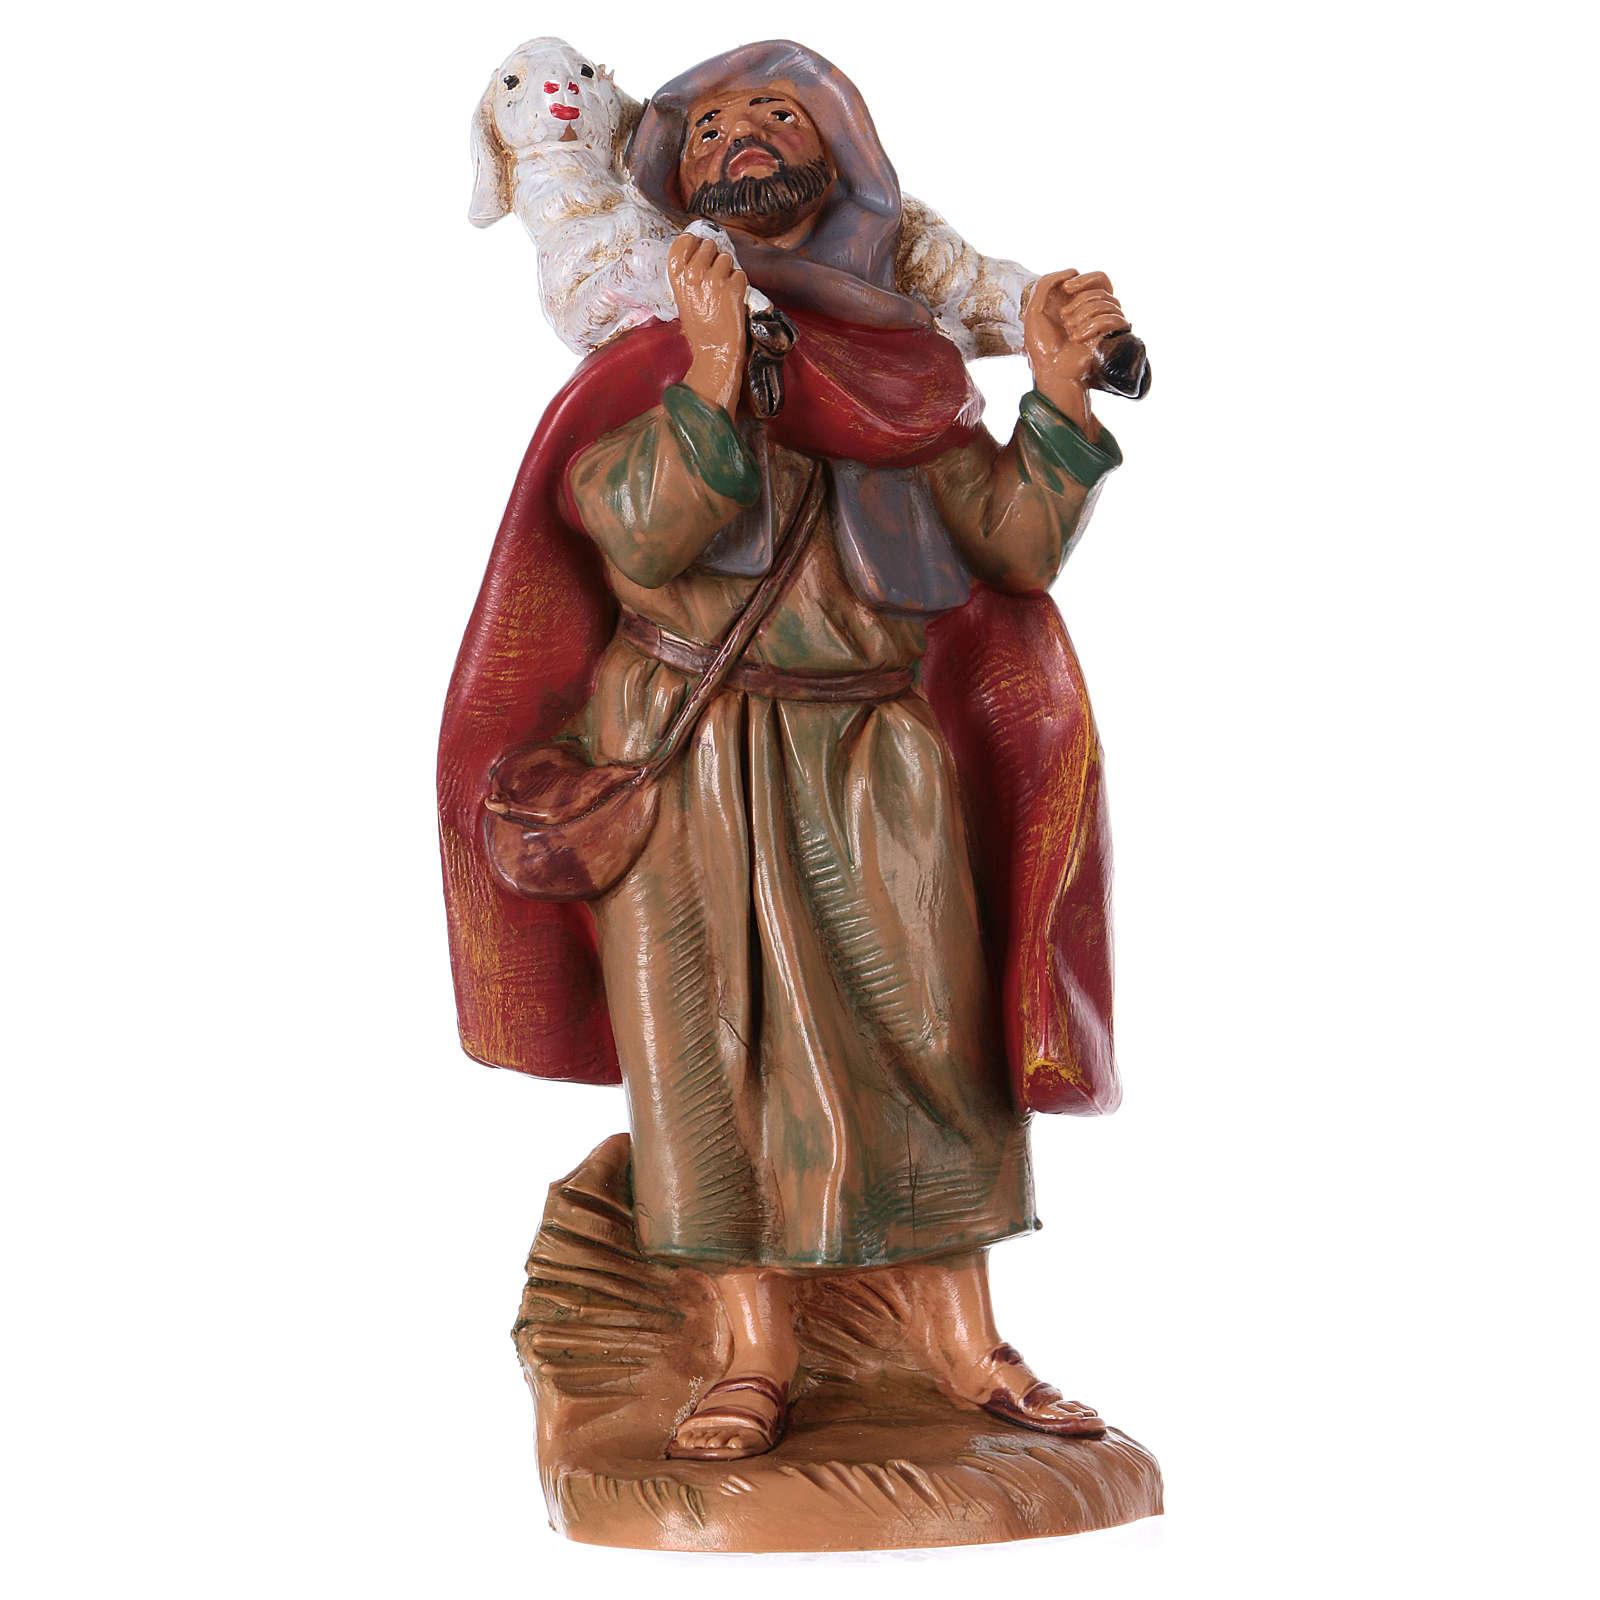 Pastor con oveja sobre las espaldas 12 cm de altura media Fontanini 4